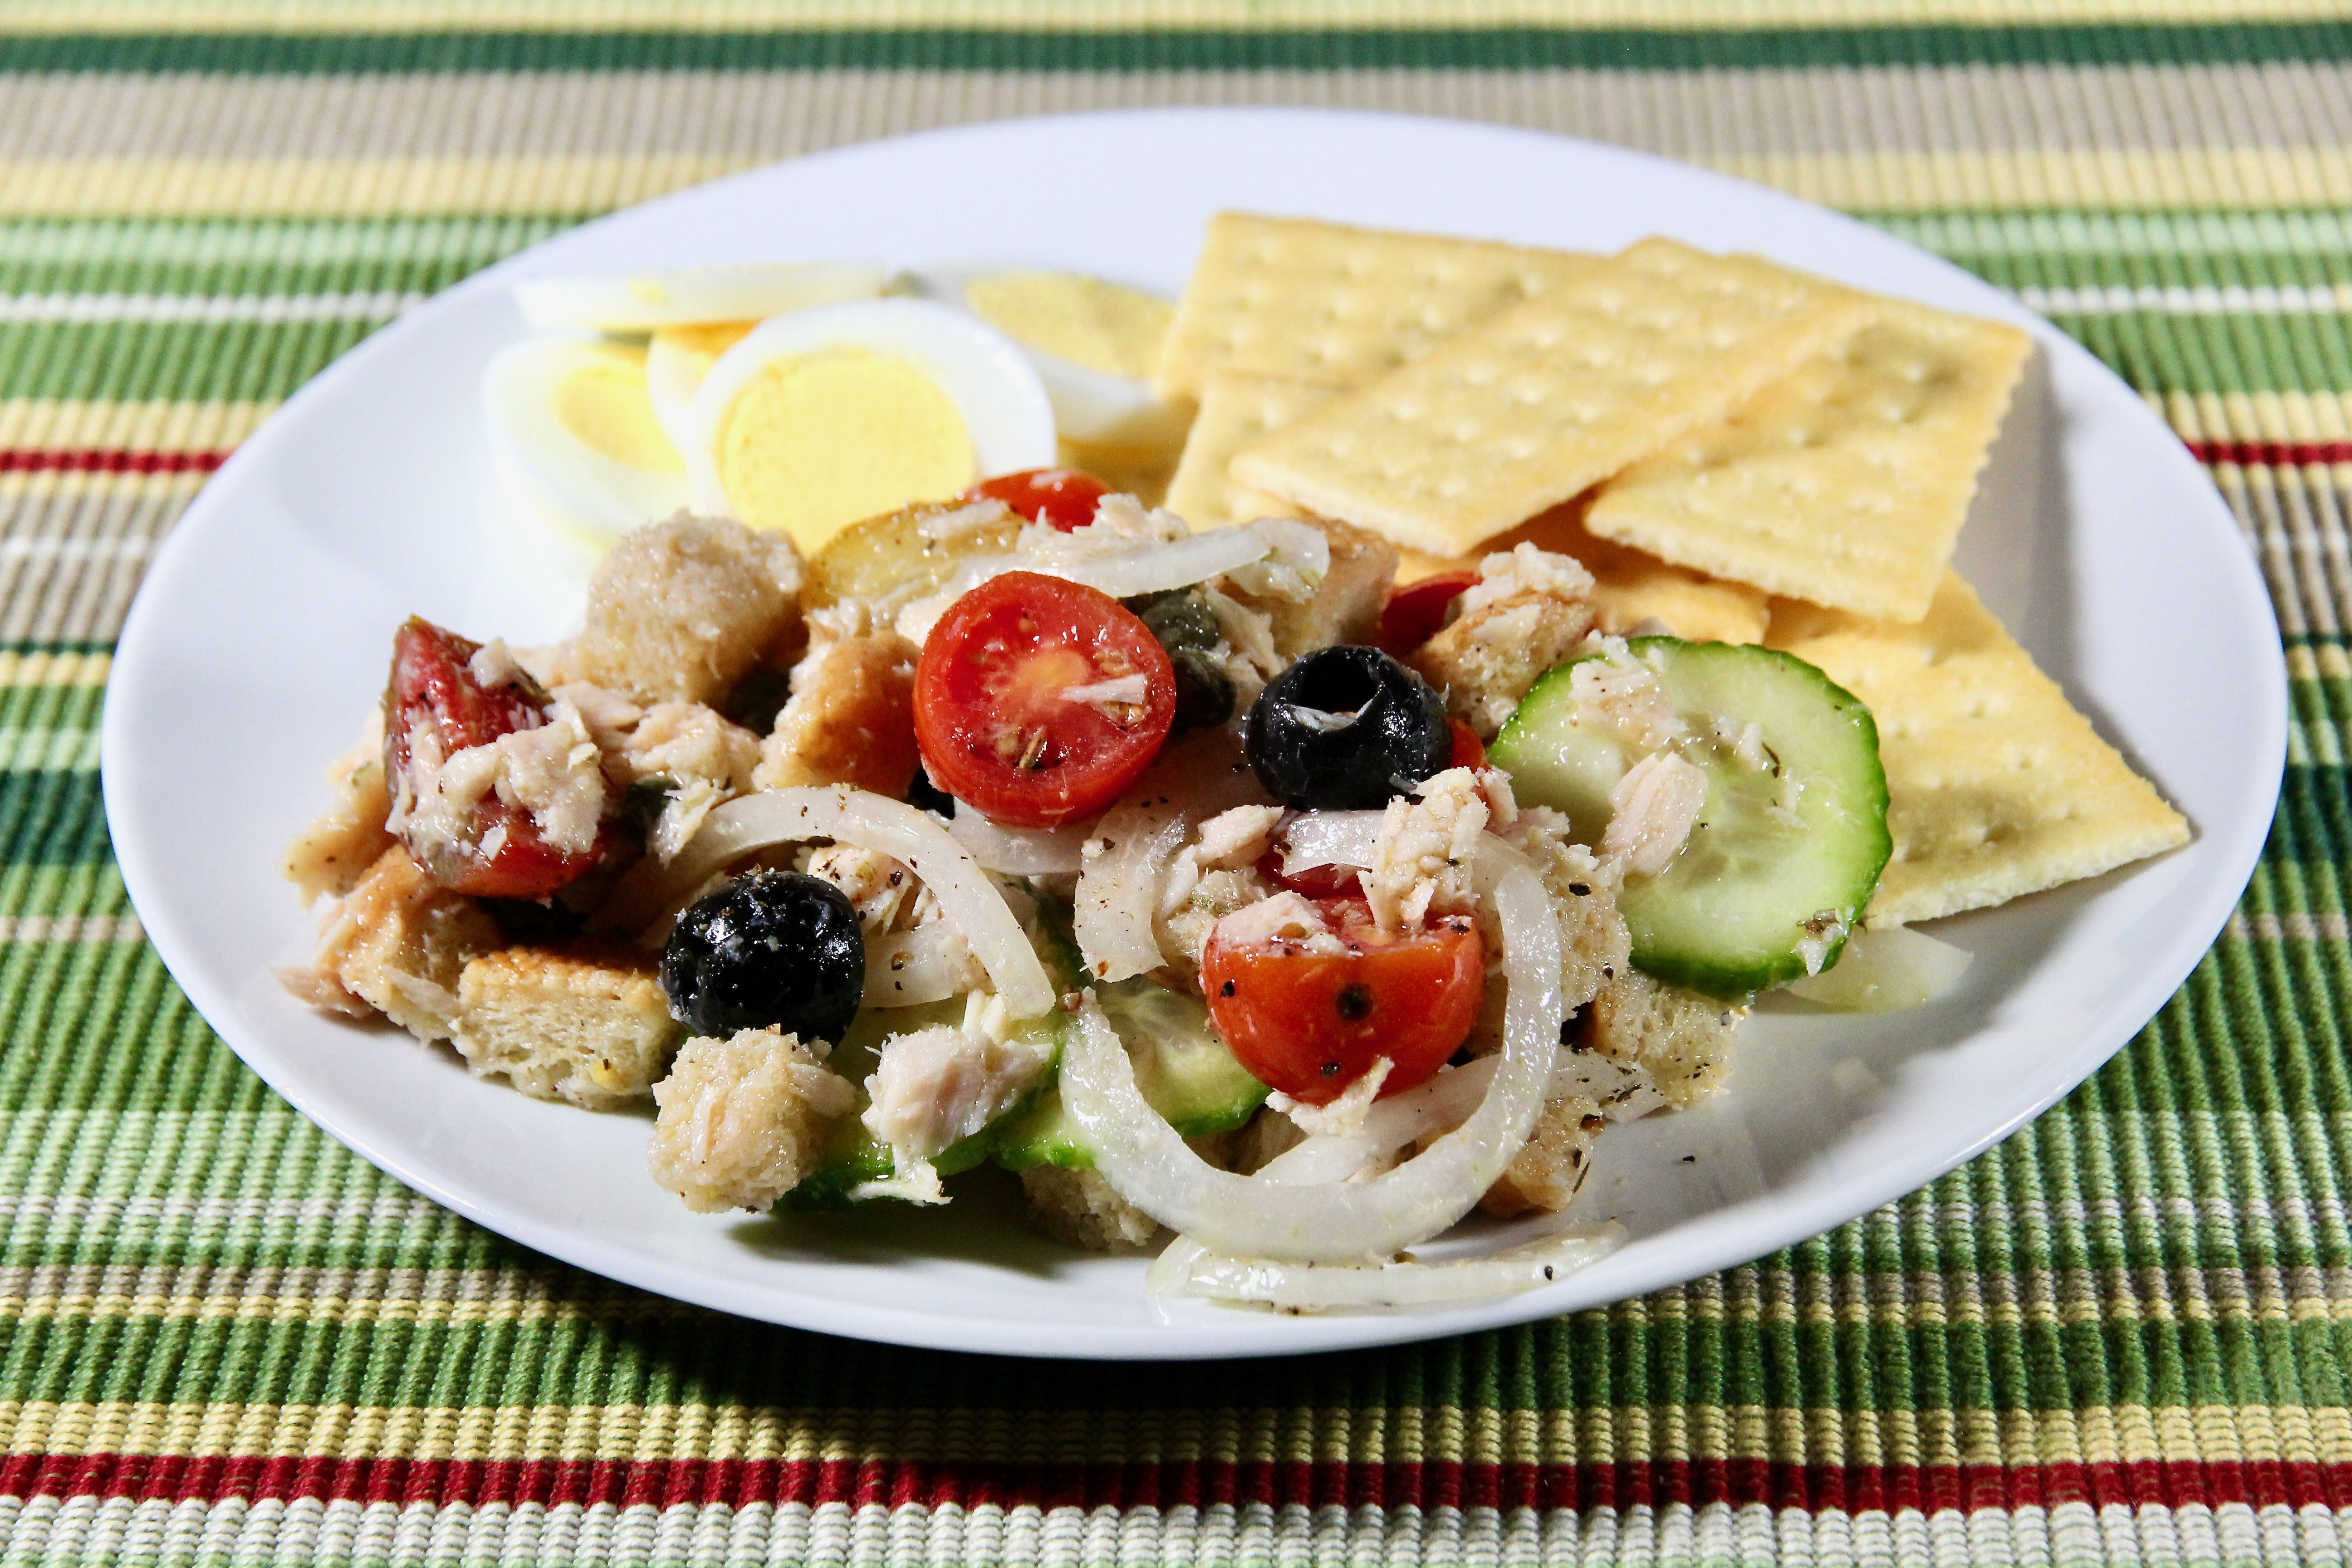 Italian-Style Tuna Salad